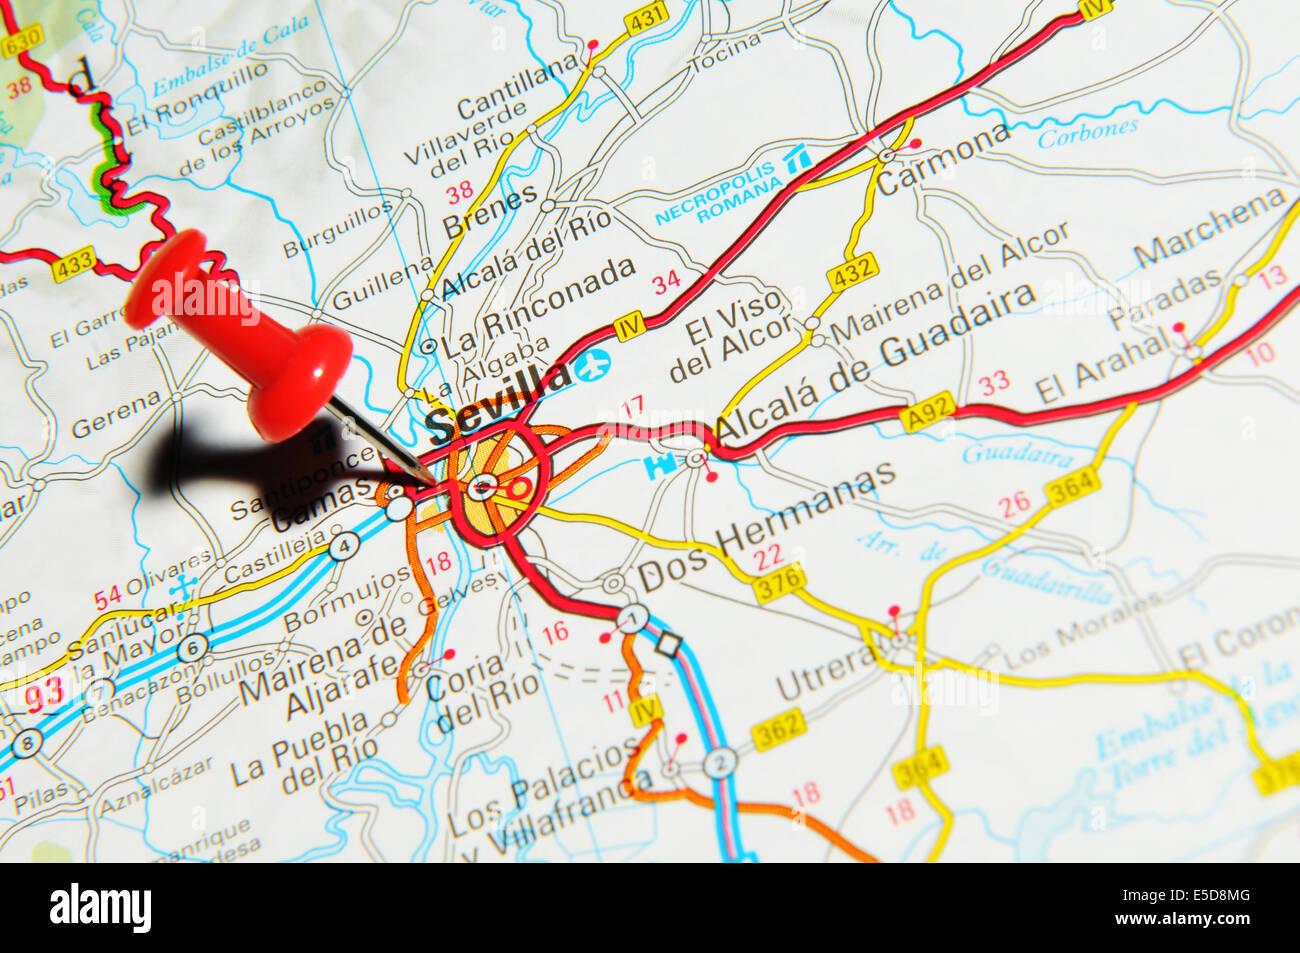 Sevilla on map Stock Photo: 72206976 - Alamy